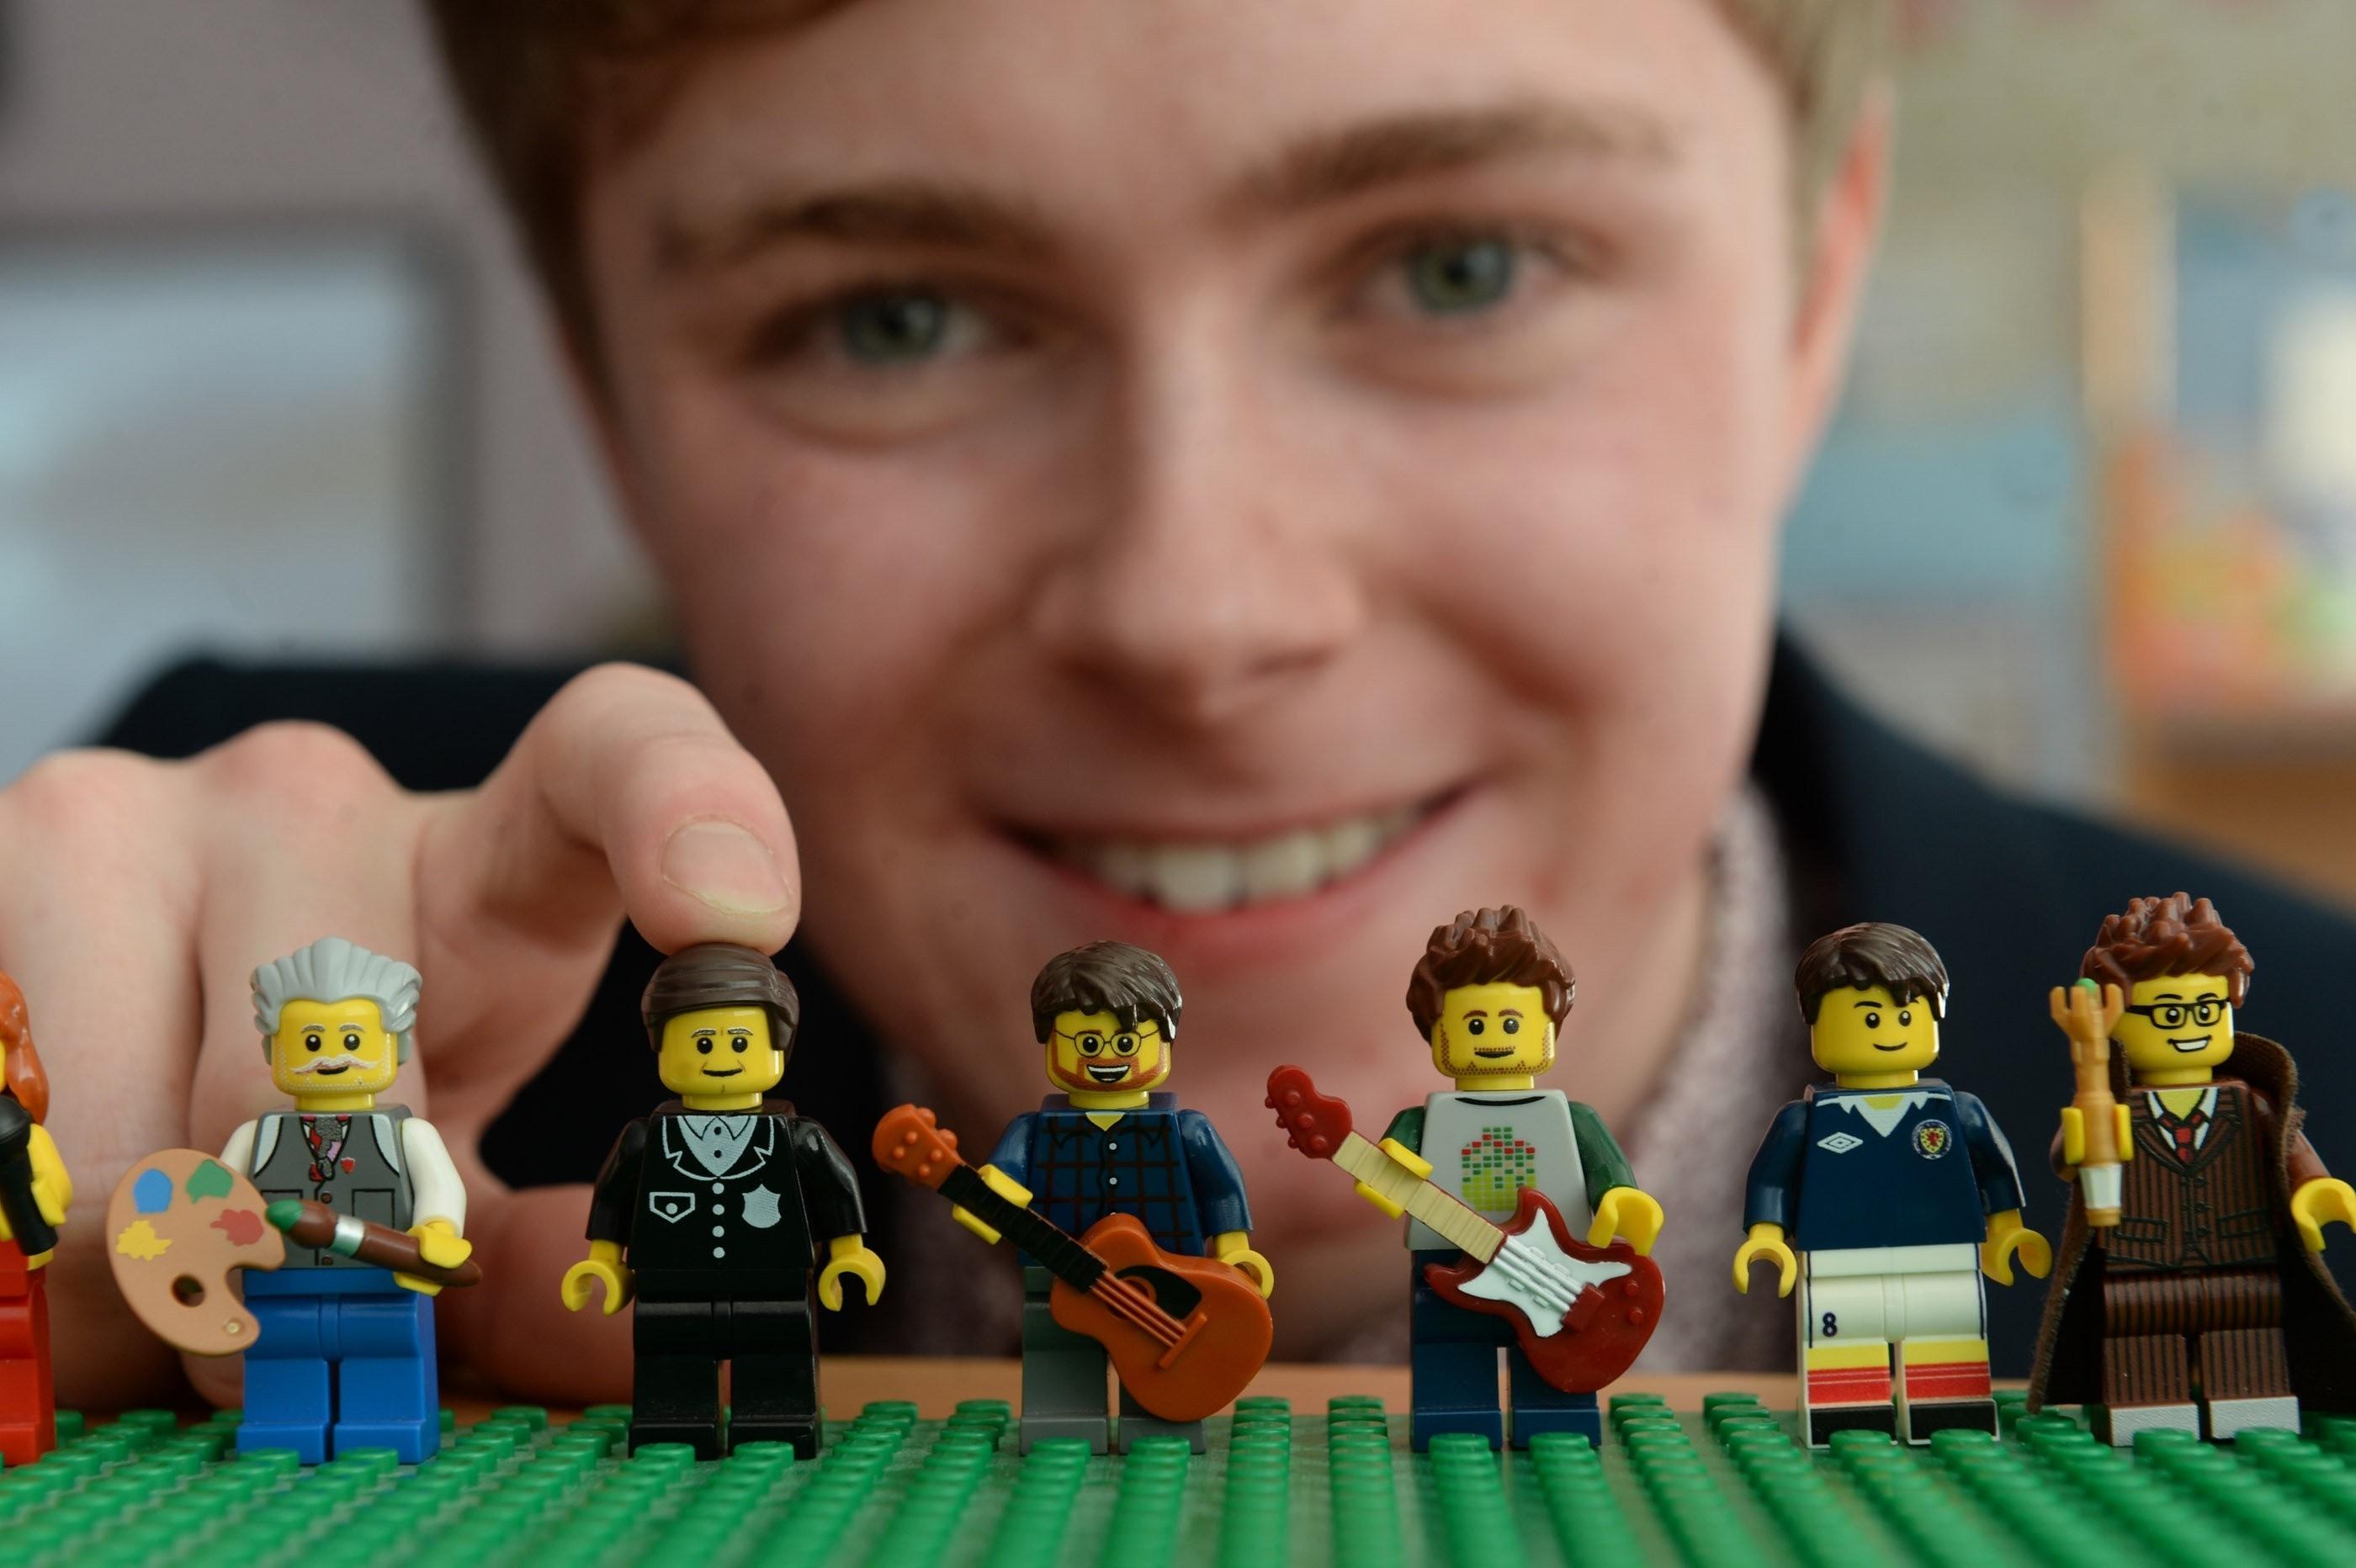 Teenage Lego animator Morgan Spence